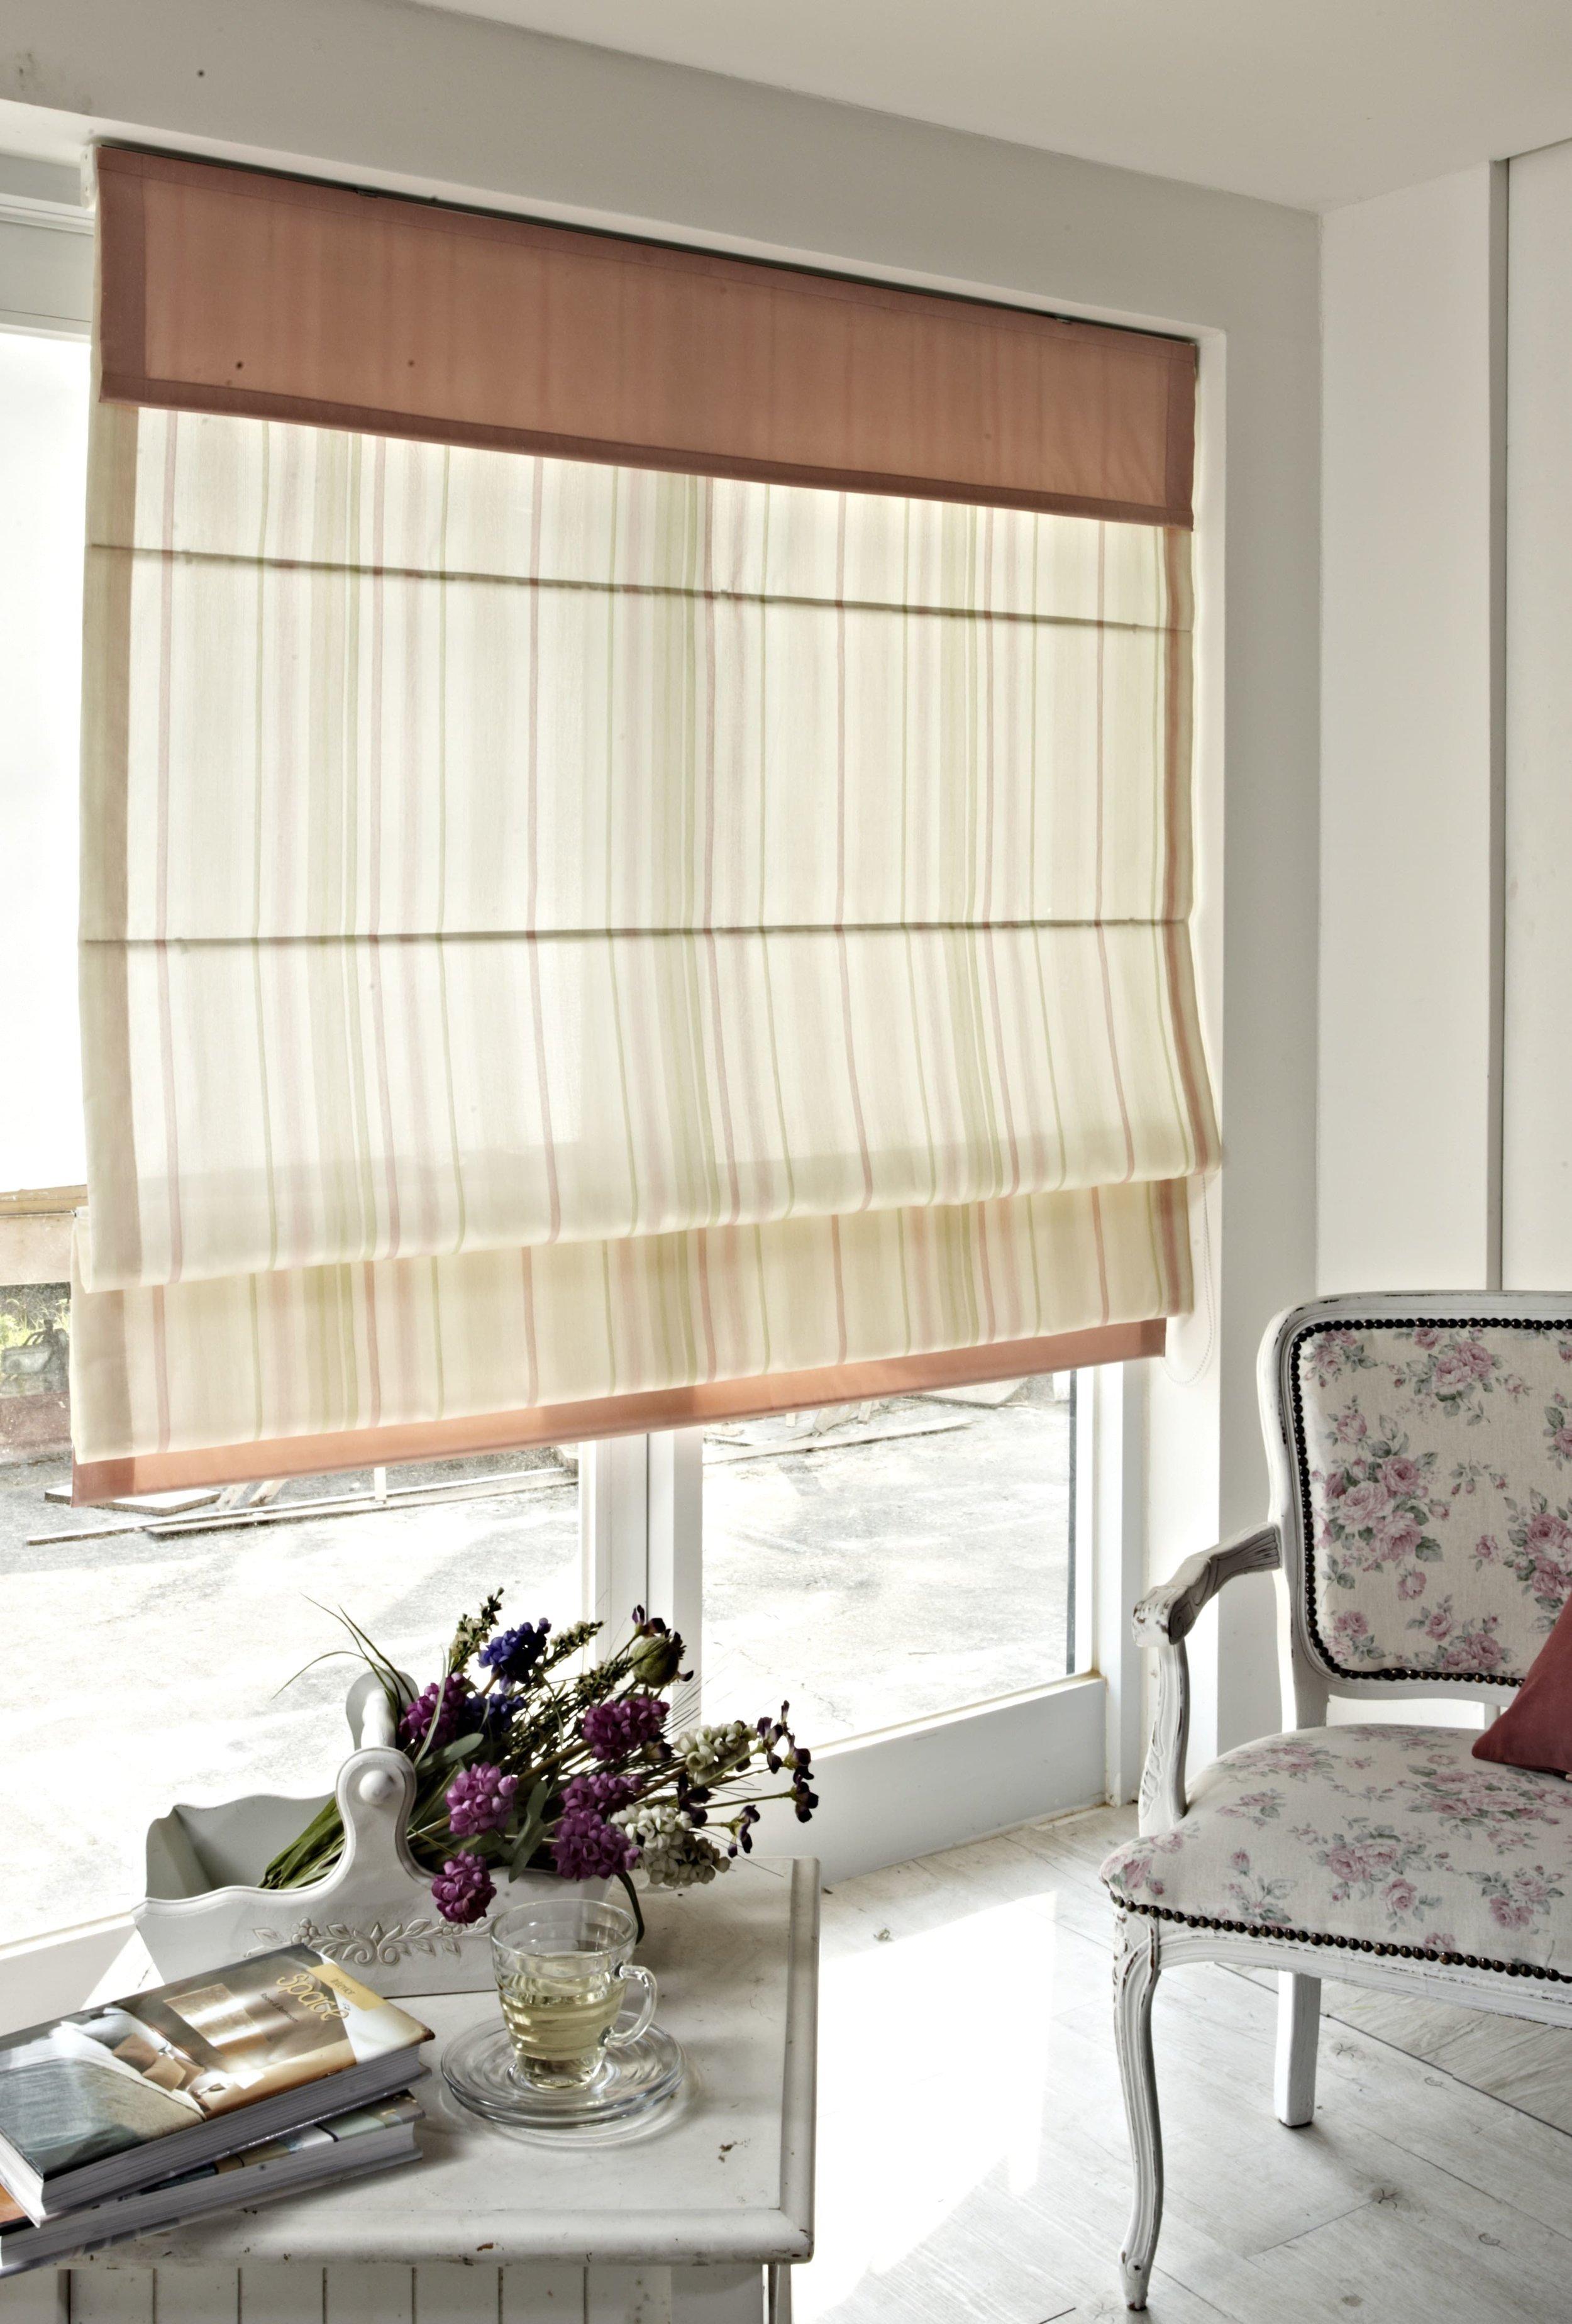 architecture-chair-furniture-279640-min.jpg